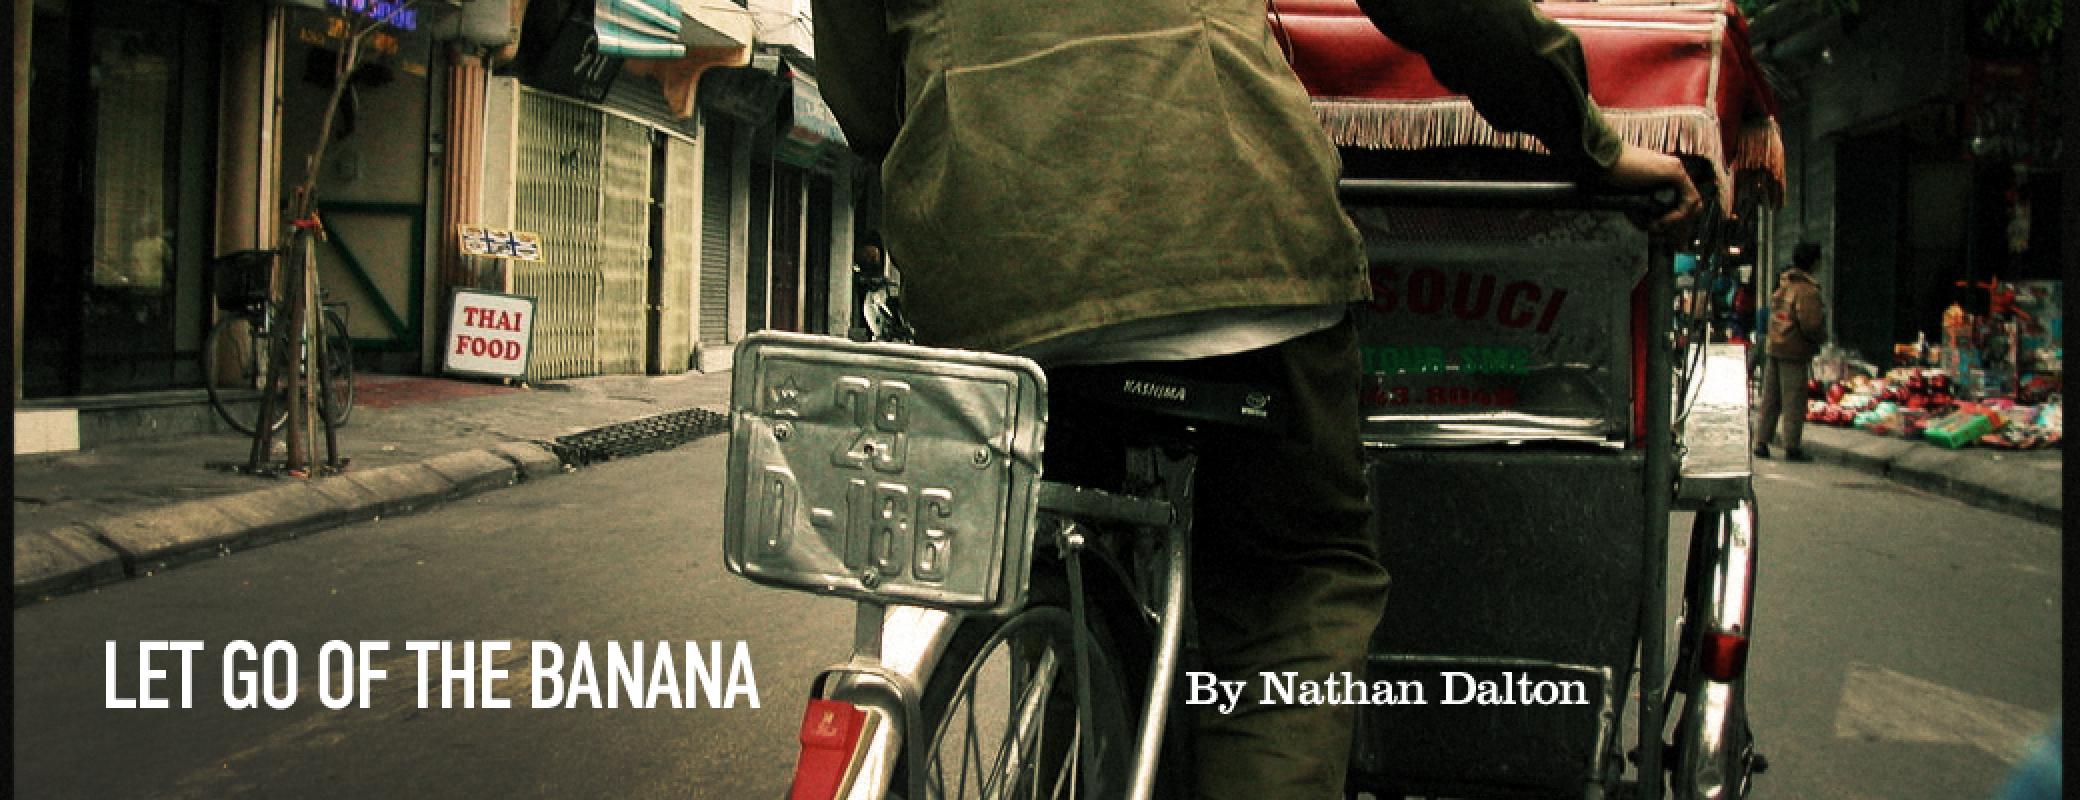 let-go-of-the-banana-by-nathan-dalton@2x.jpg